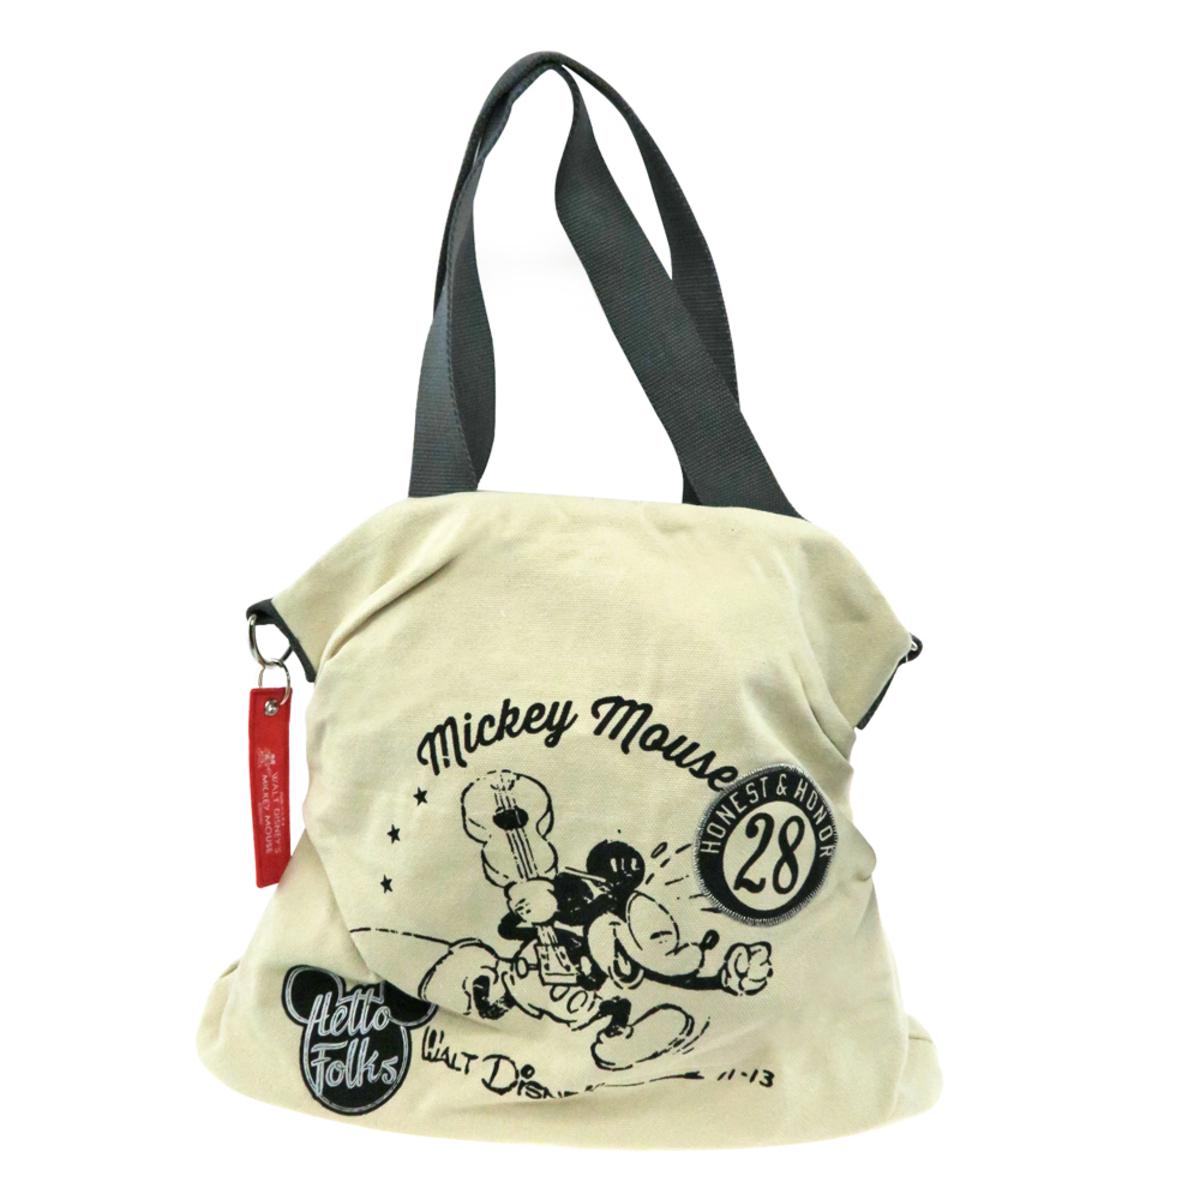 104418af1 DISNEY MICKEY MOUSE HELLO FOLKS CANVAS TOTE BAG   Go Shop